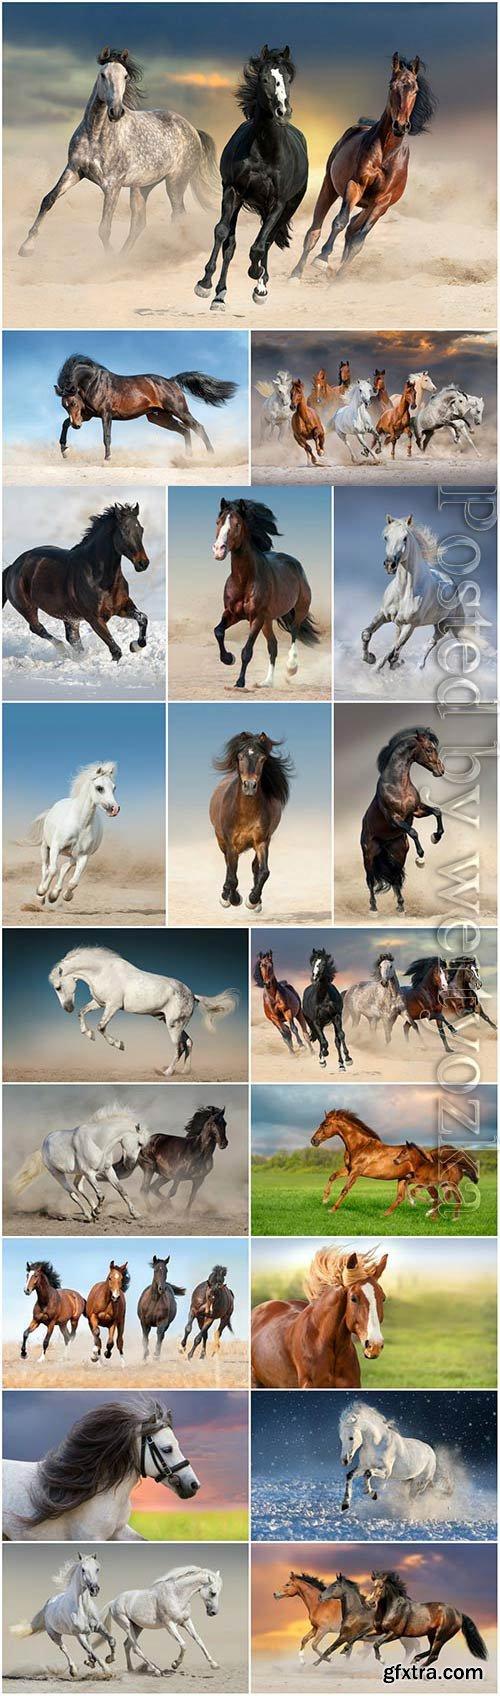 Purebred horses in nature stock photo